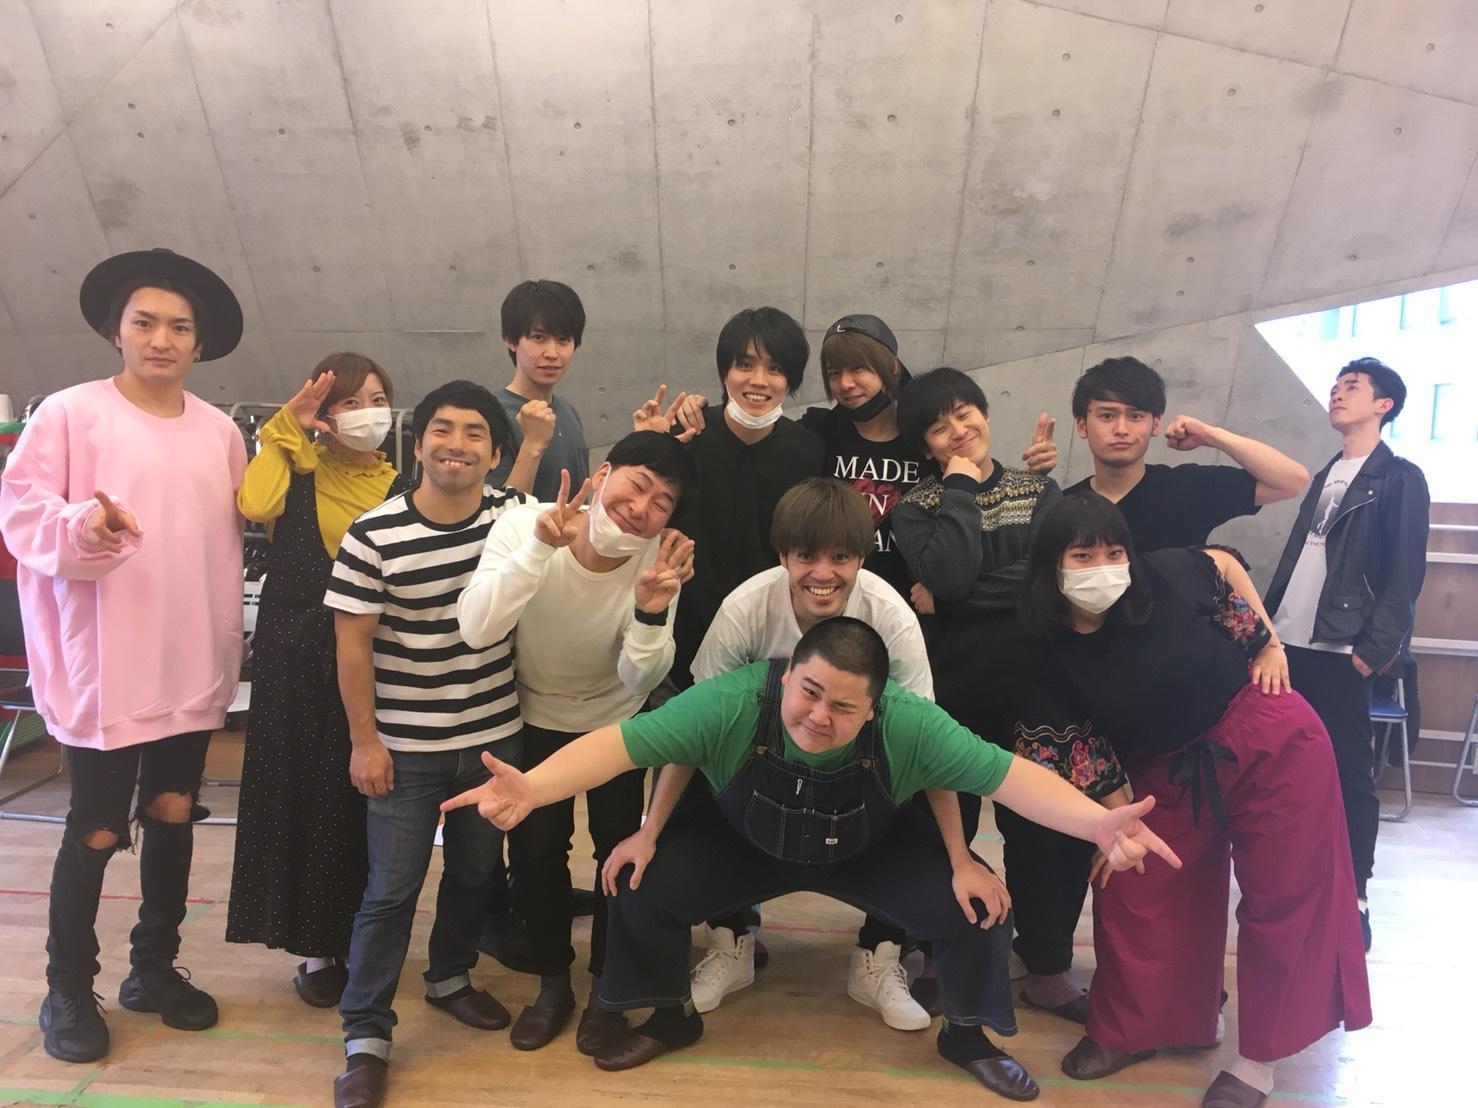 http://news.yoshimoto.co.jp/20180330095142-d74c998a0d51d1968e2214eb877732ca67706a95.jpg